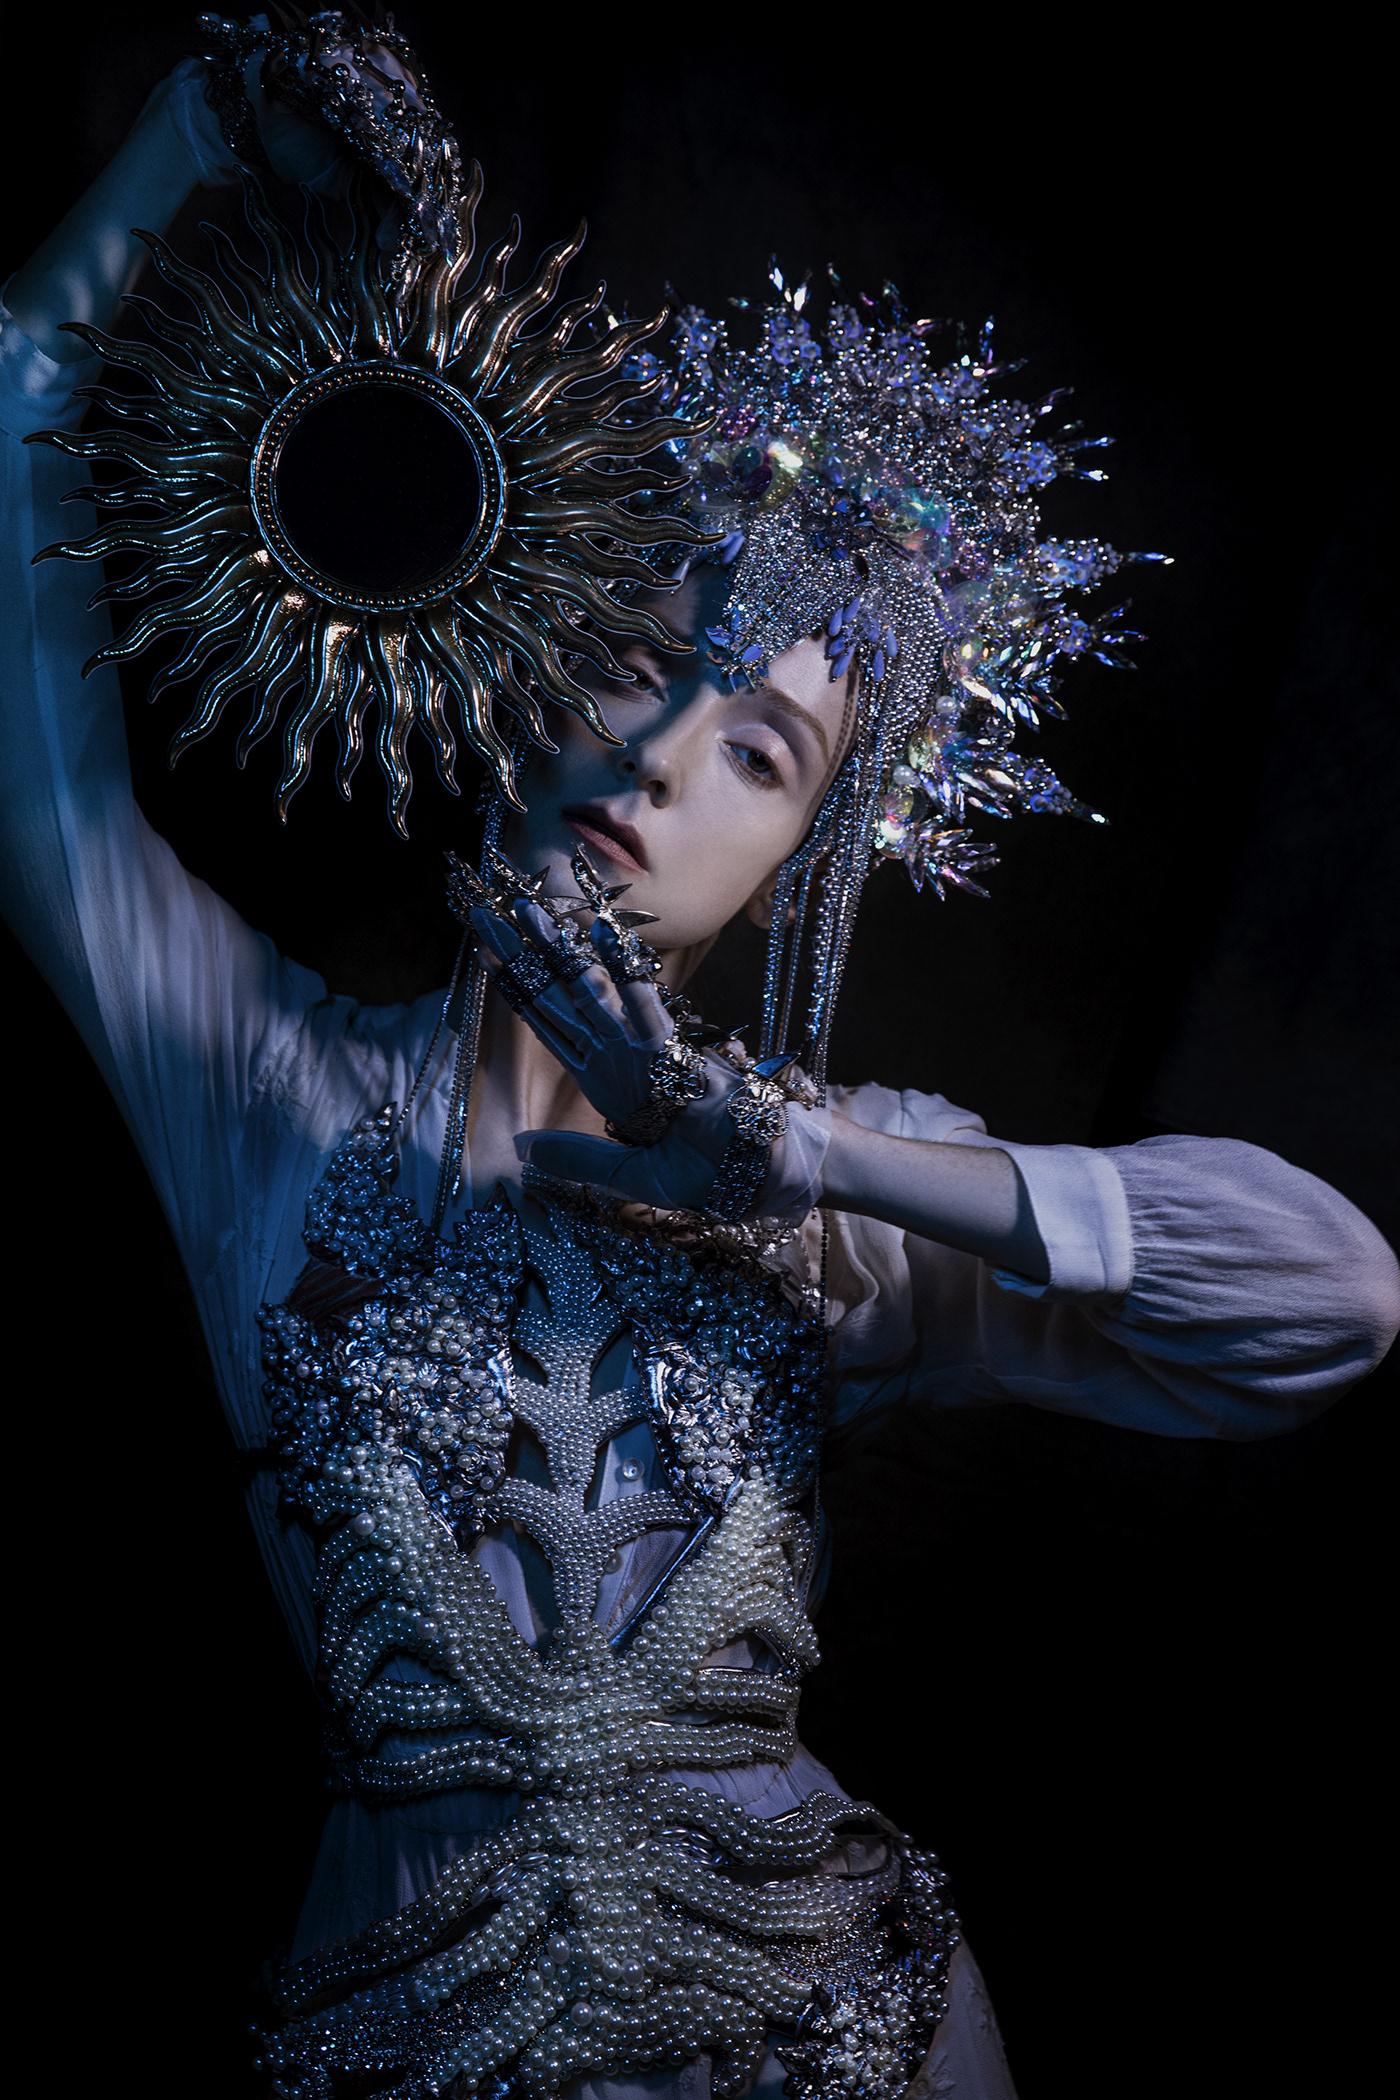 art corset crown DANCE   Folklore medival pearl Princess scull